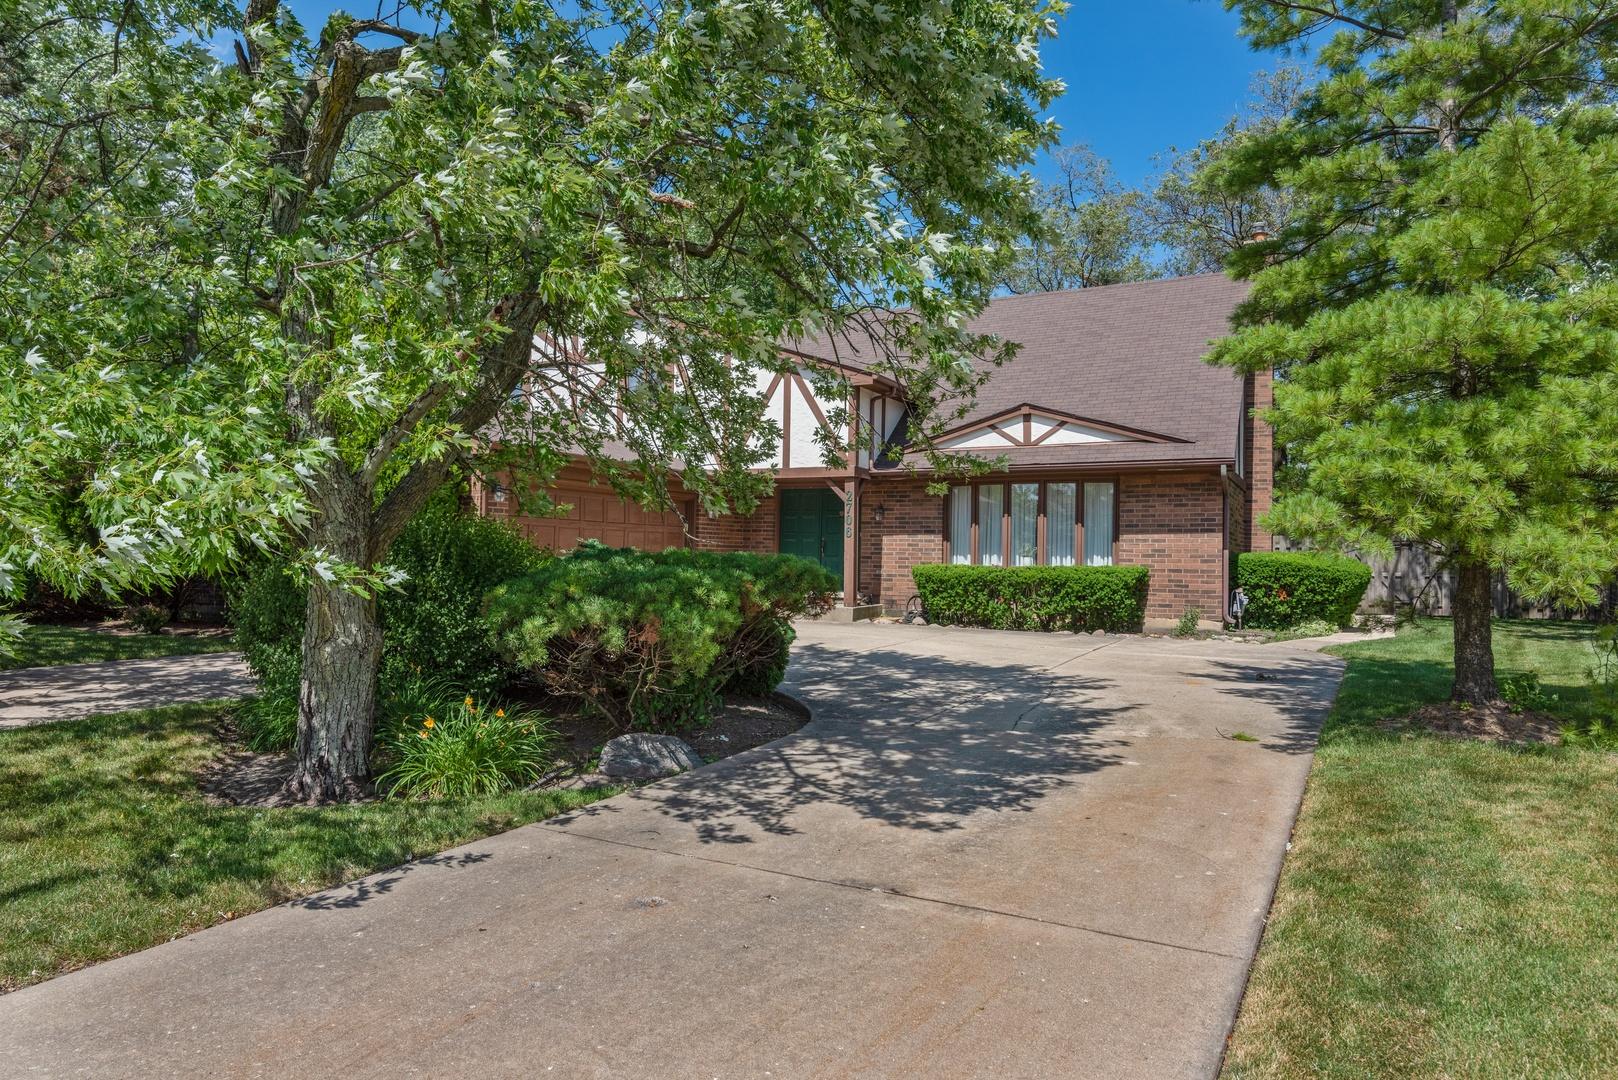 2706 Maynard, Glenview, Illinois, 60025